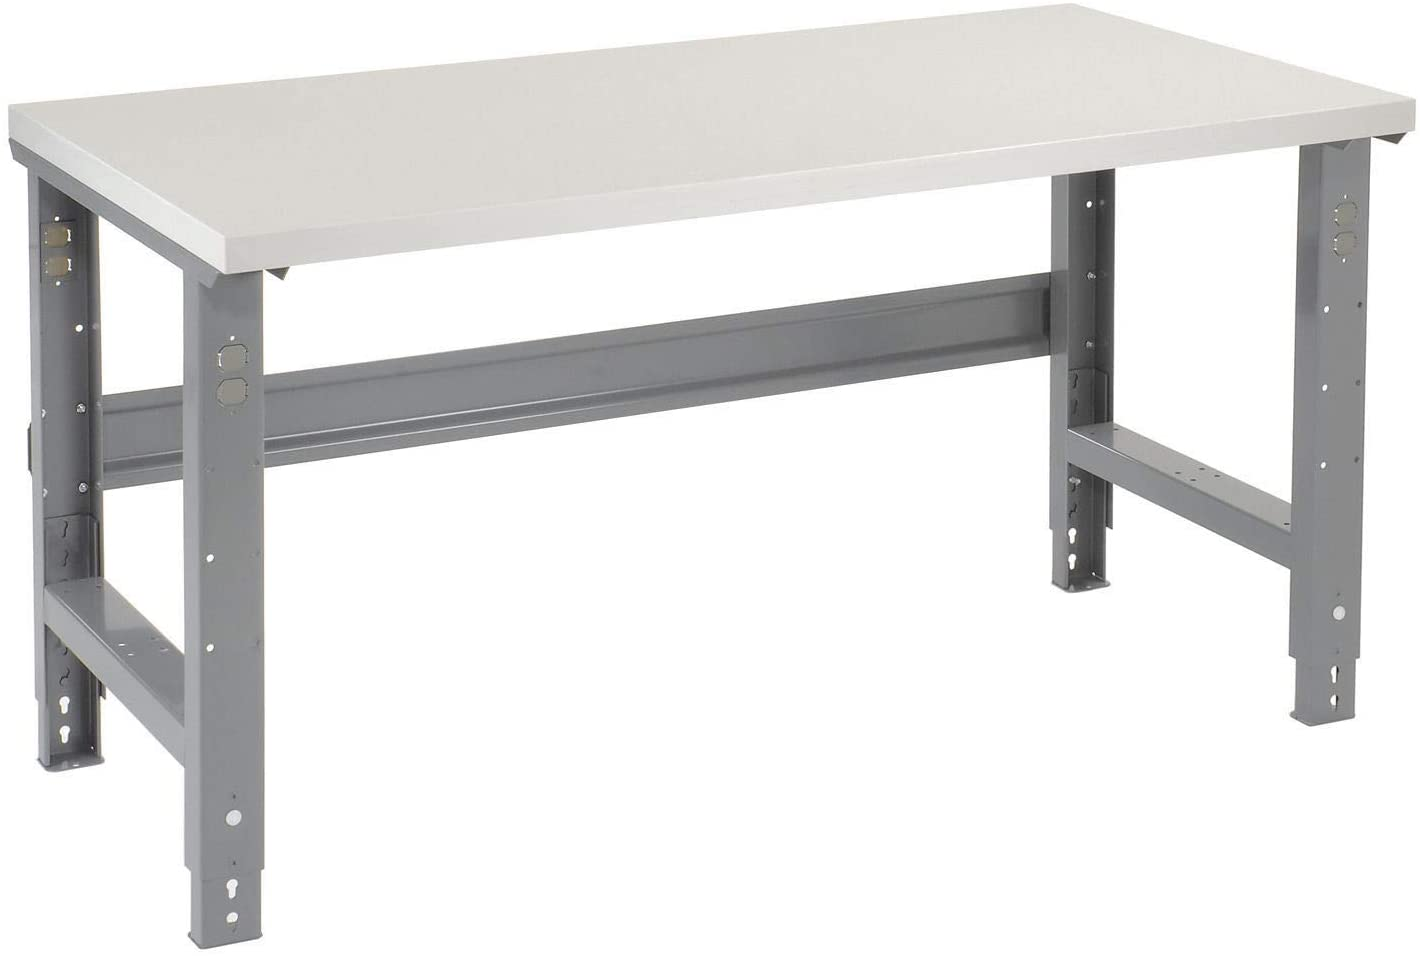 Adjustable Height Workbench C-Channel Leg, Plastic Laminate Square Edge, 60